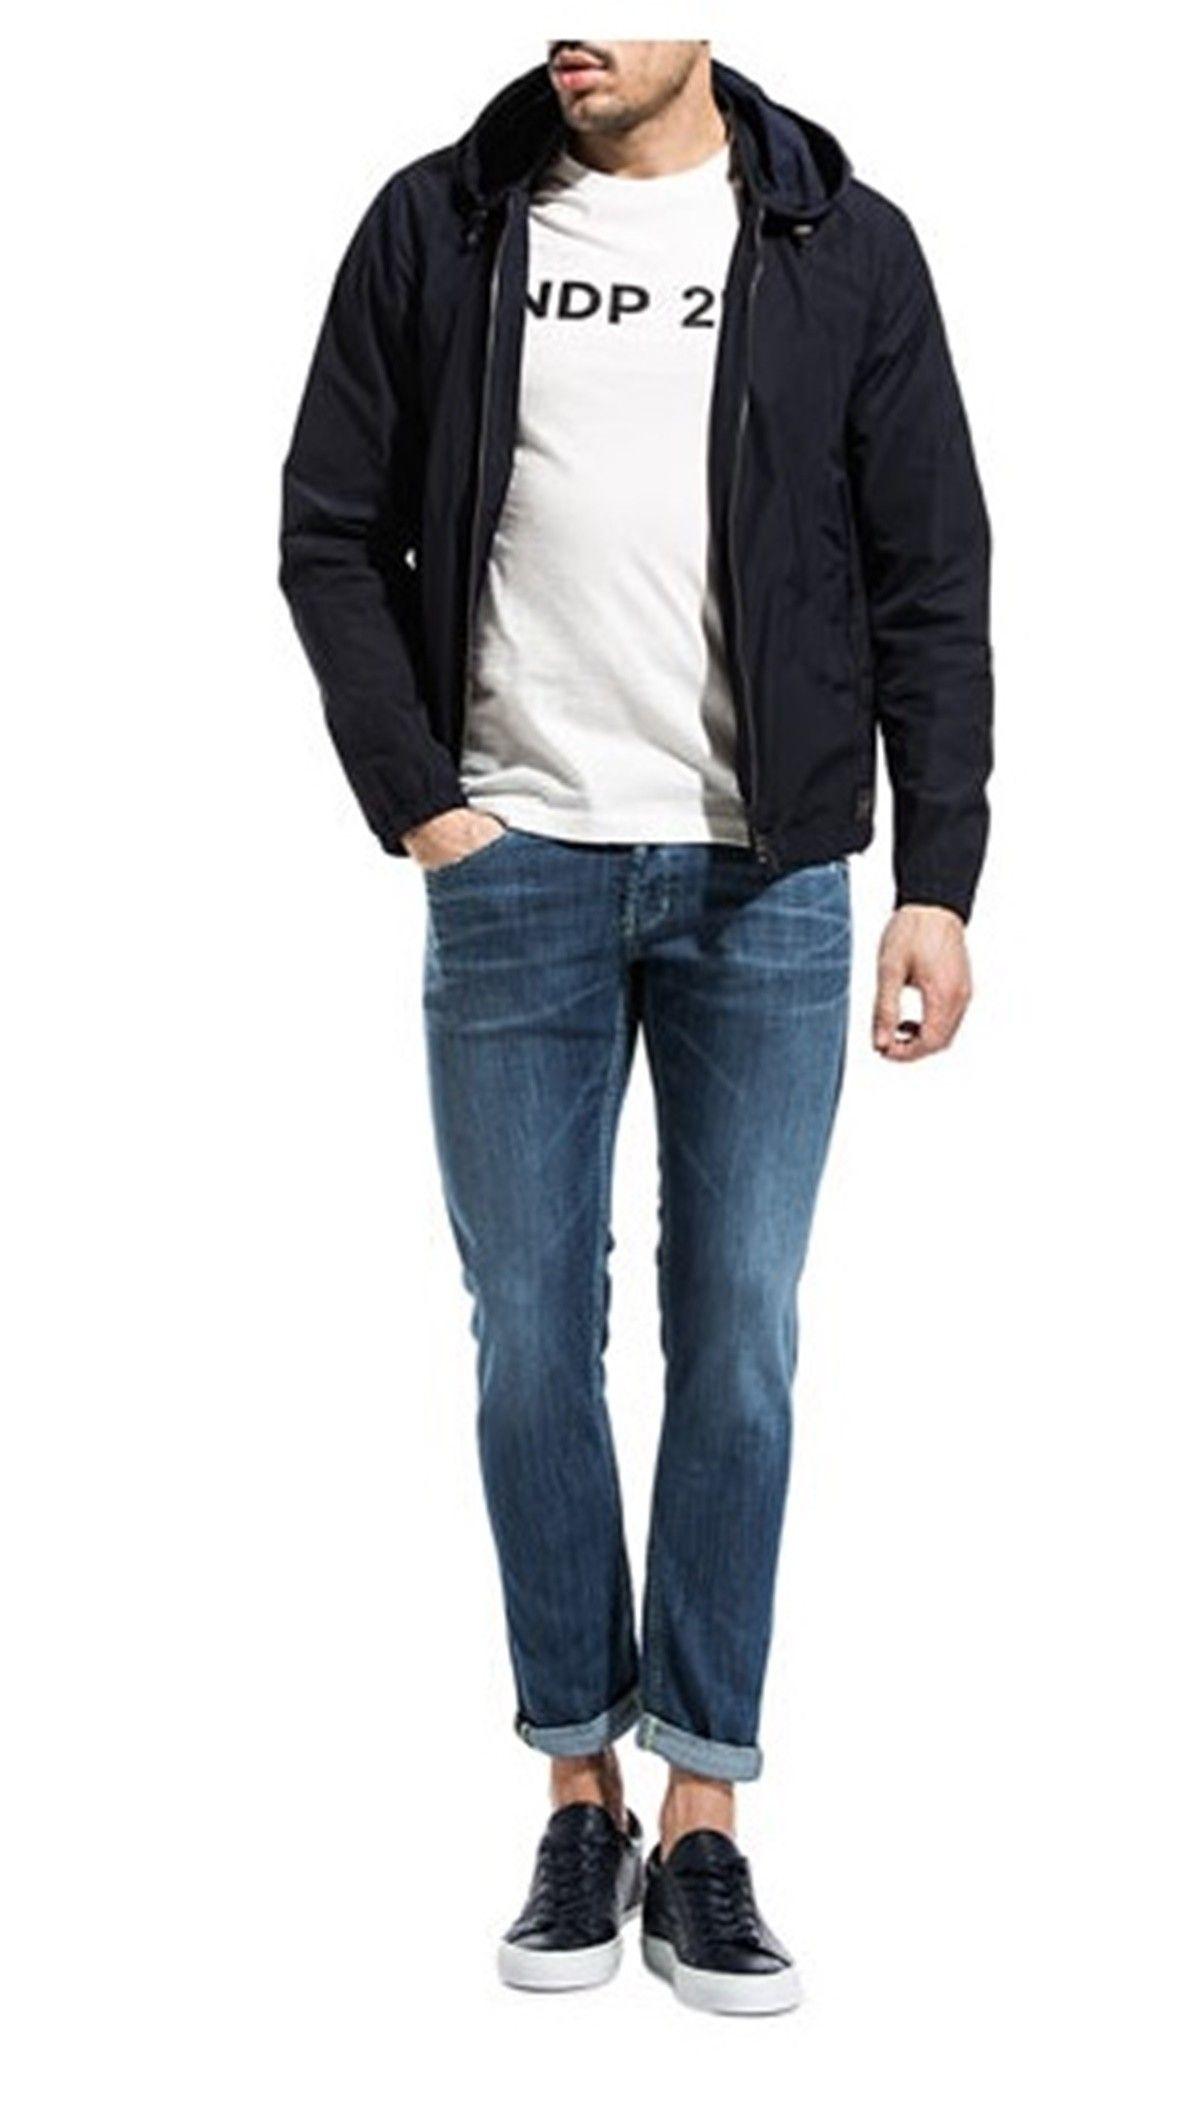 Giubbino Dondup uomo denim guru uj94df159u n96 800 jeans